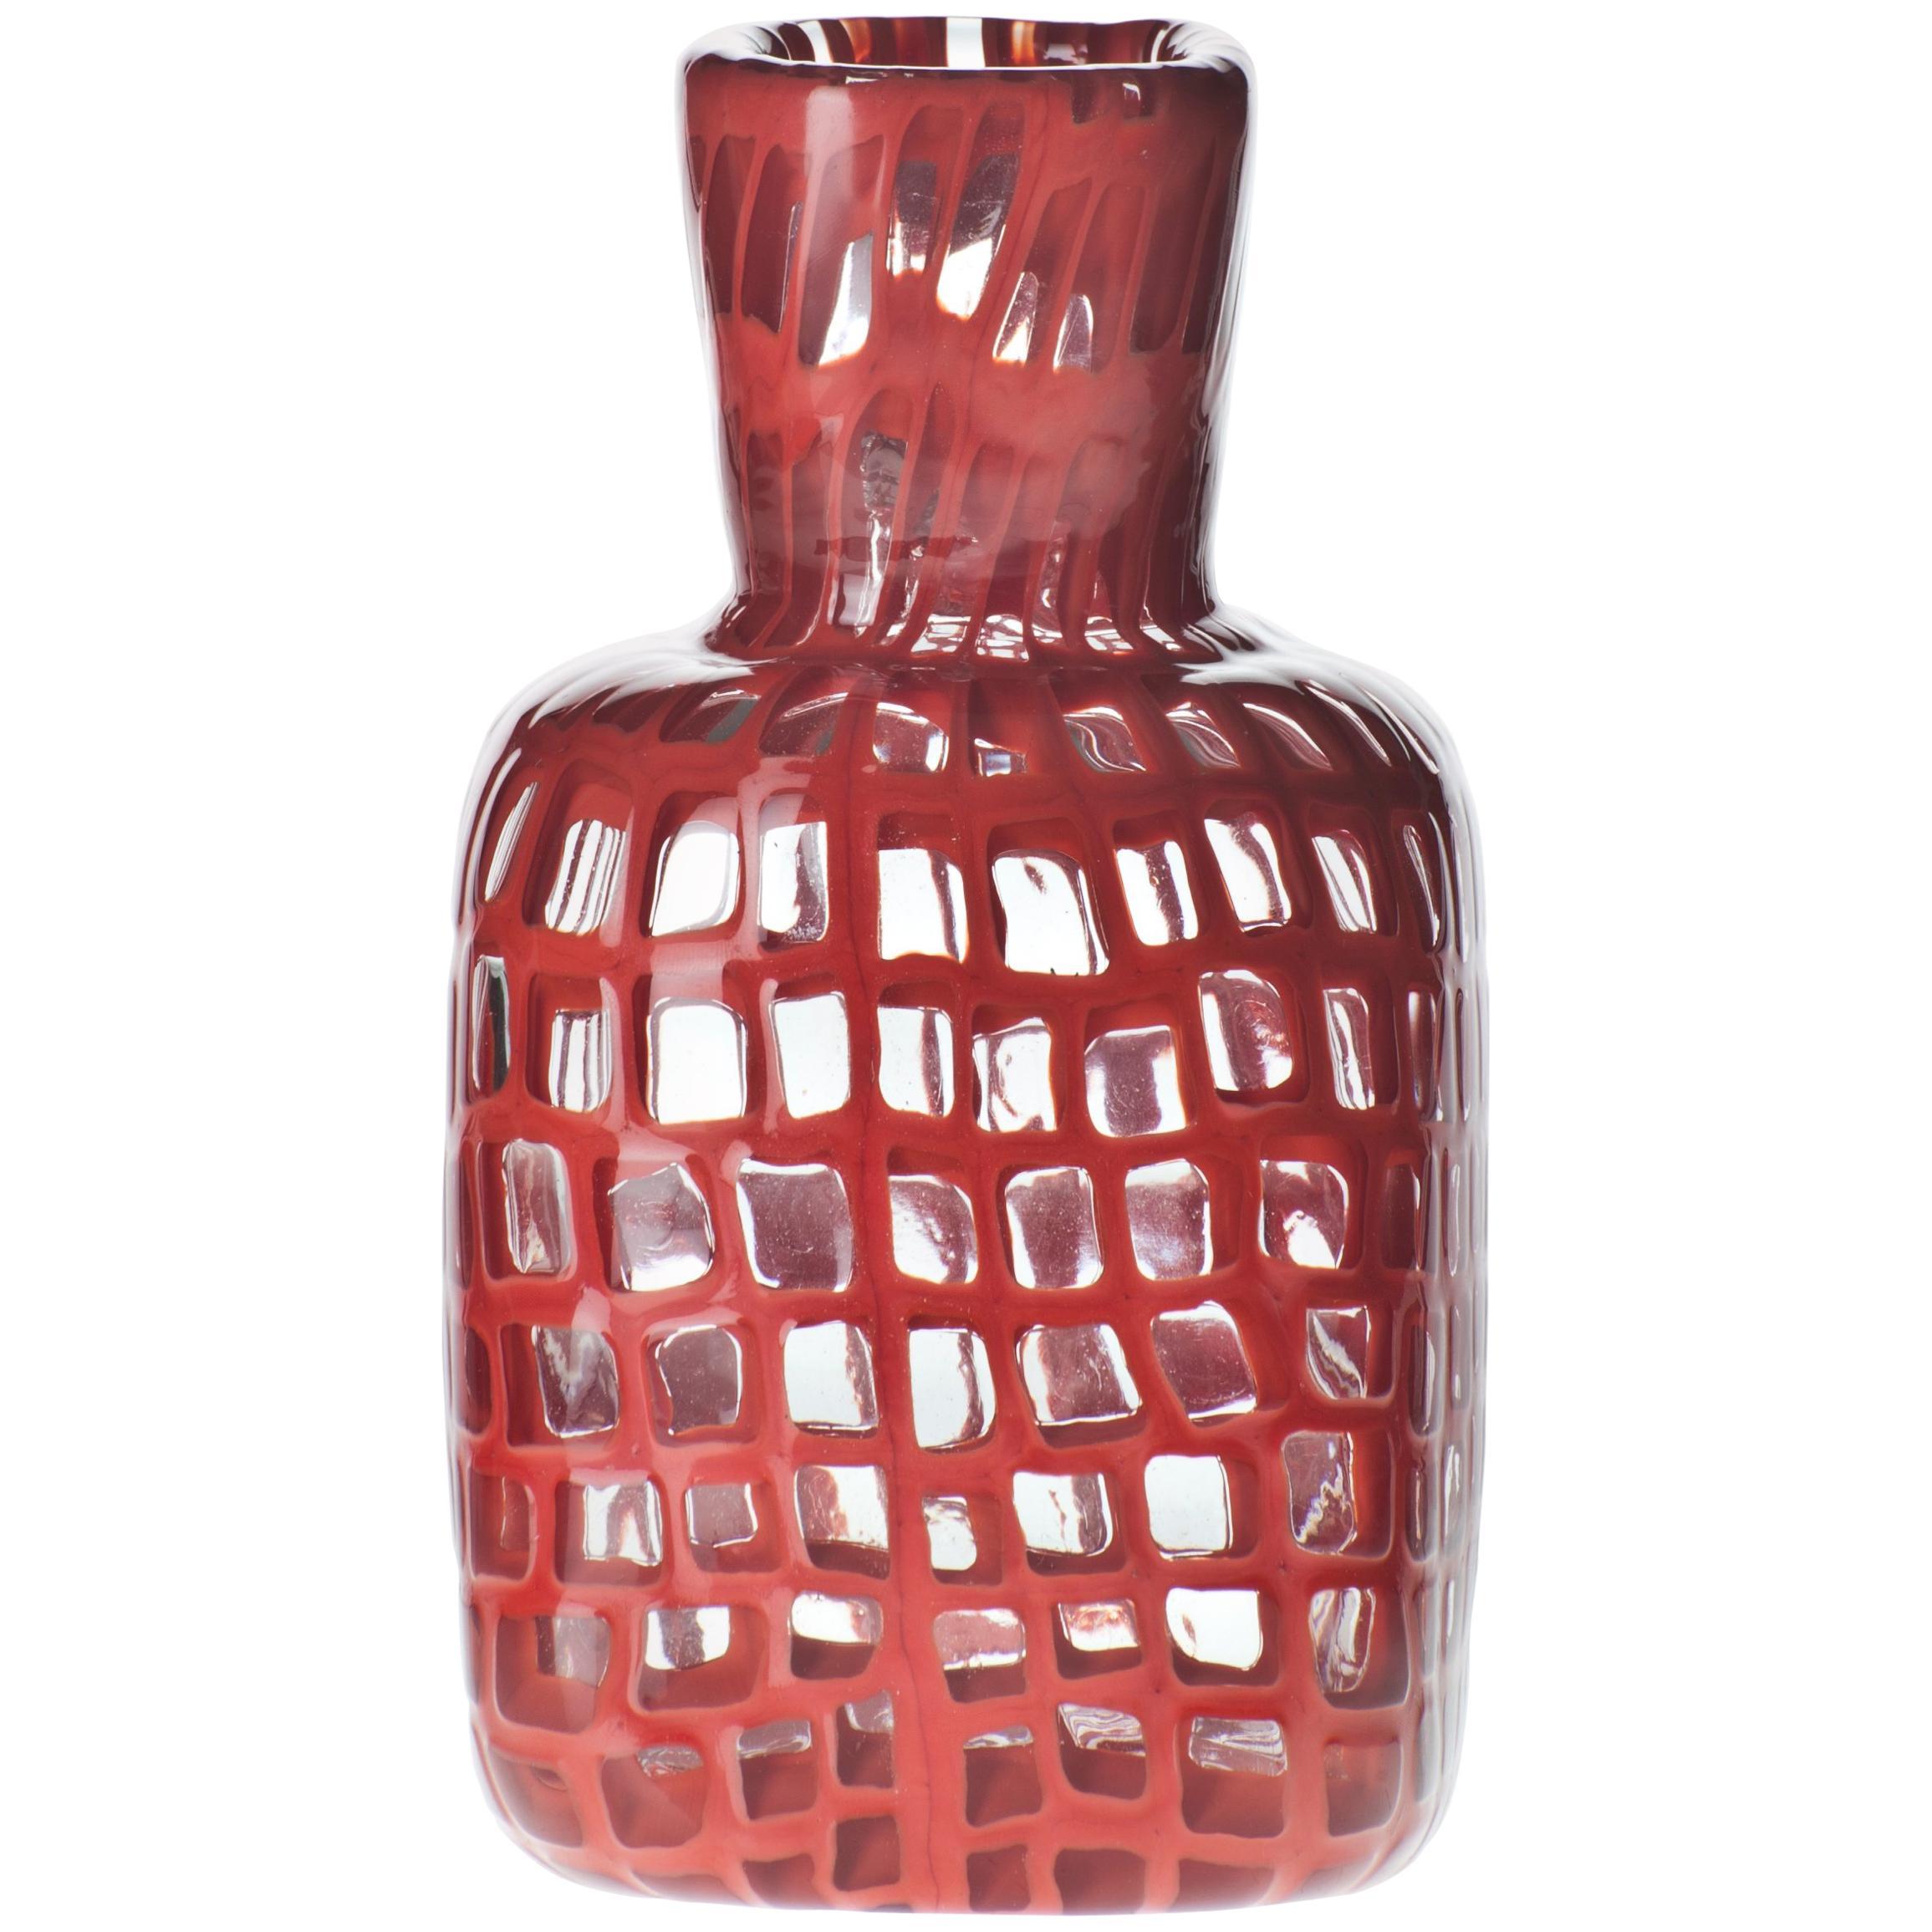 Venini Square Occhi Vase in Red by Ludovico Diaz de Santillana, Tobia Scarpa